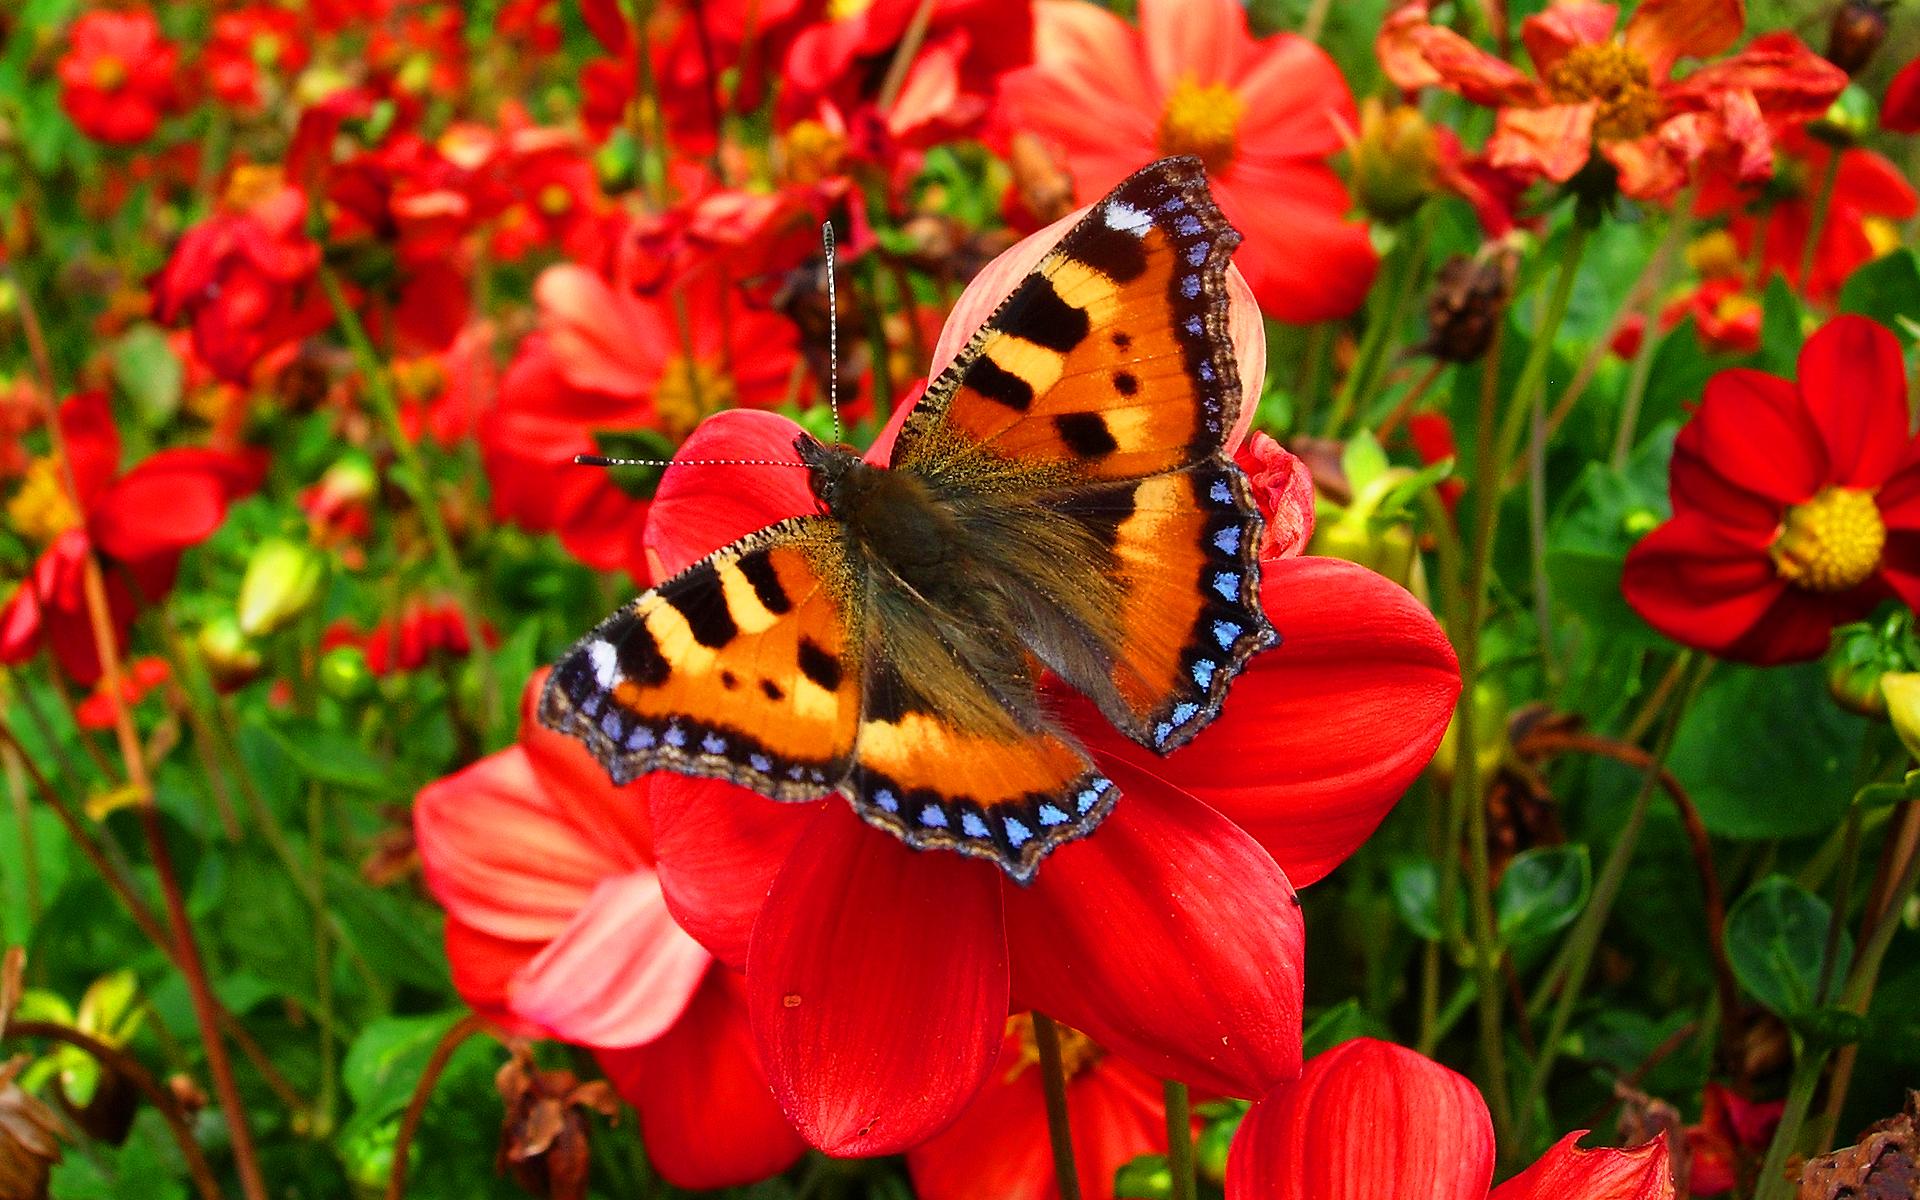 butterfly red images - HD Desktop Wallpapers | 4k HD